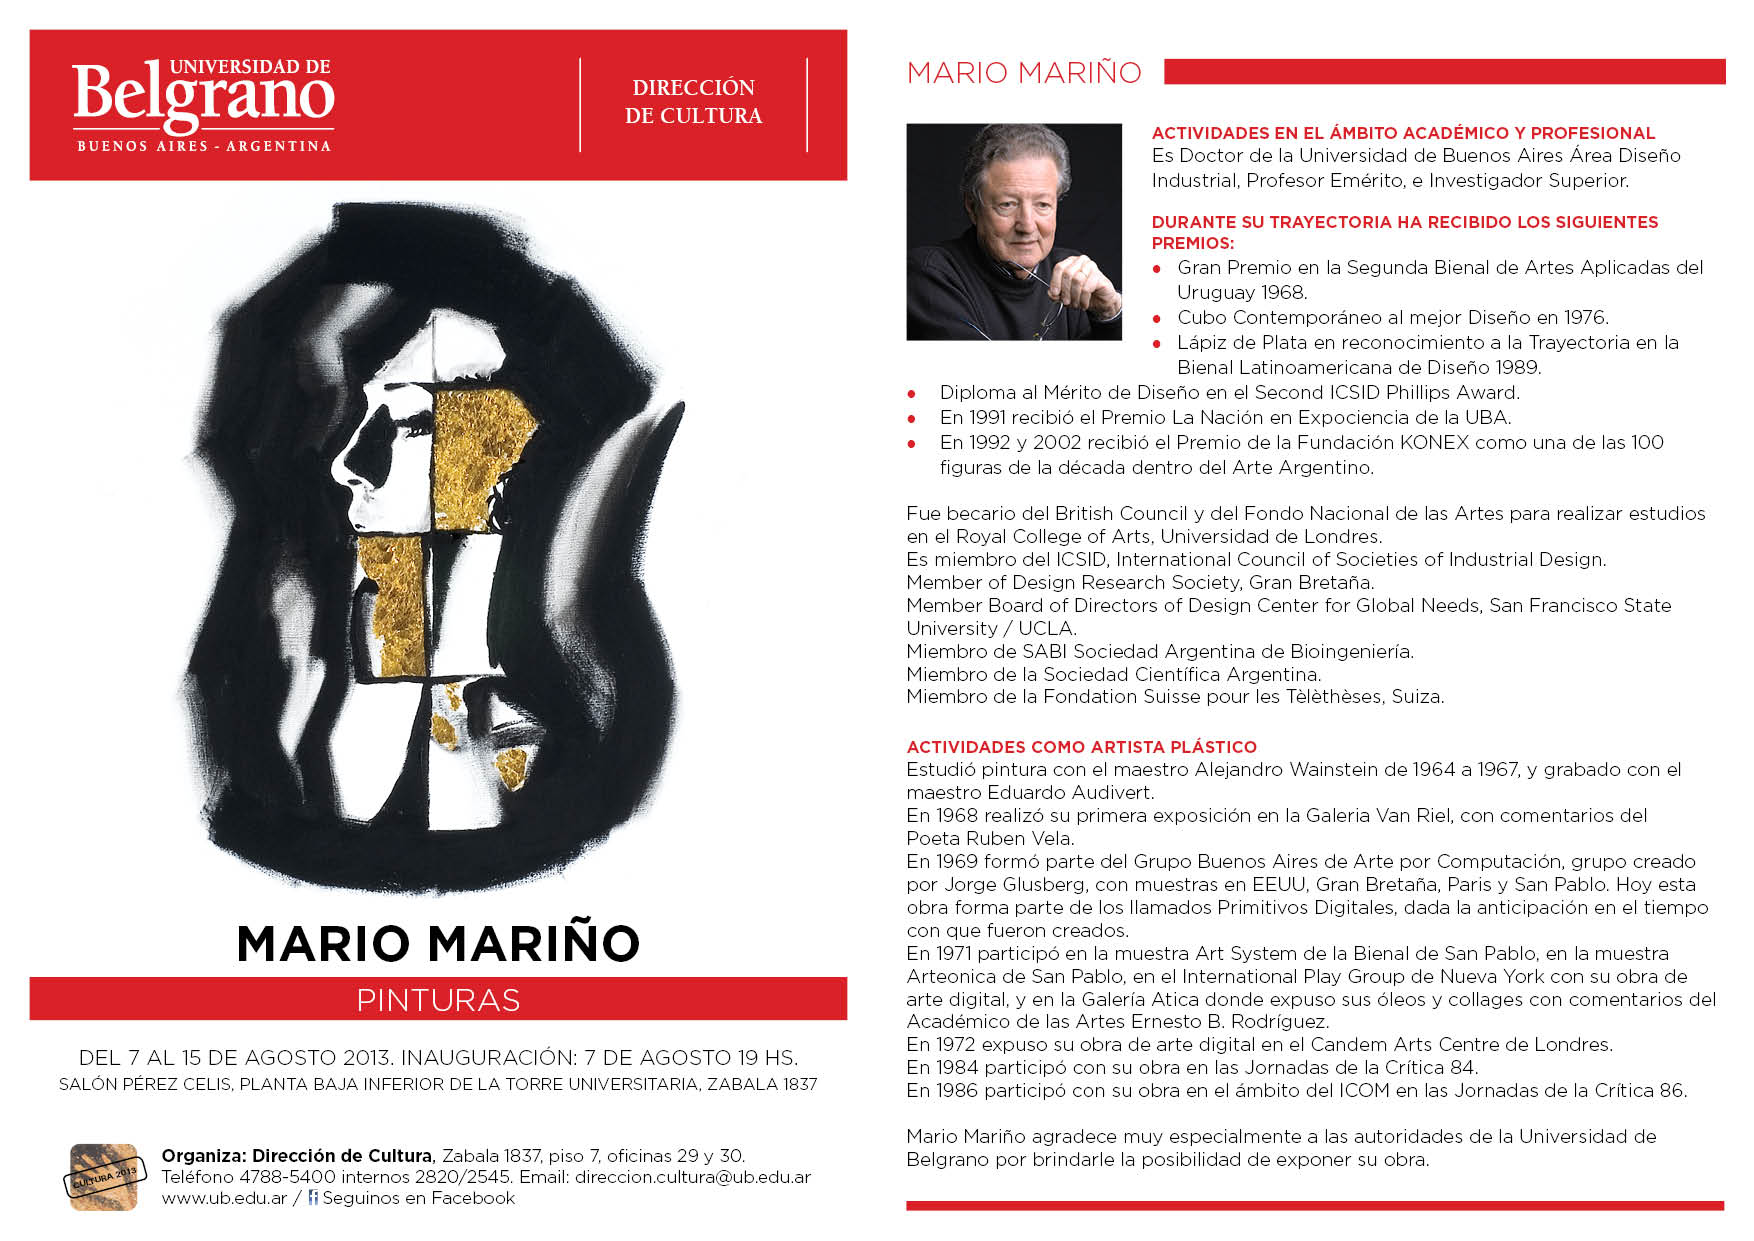 Tarjetón Mario Mariño